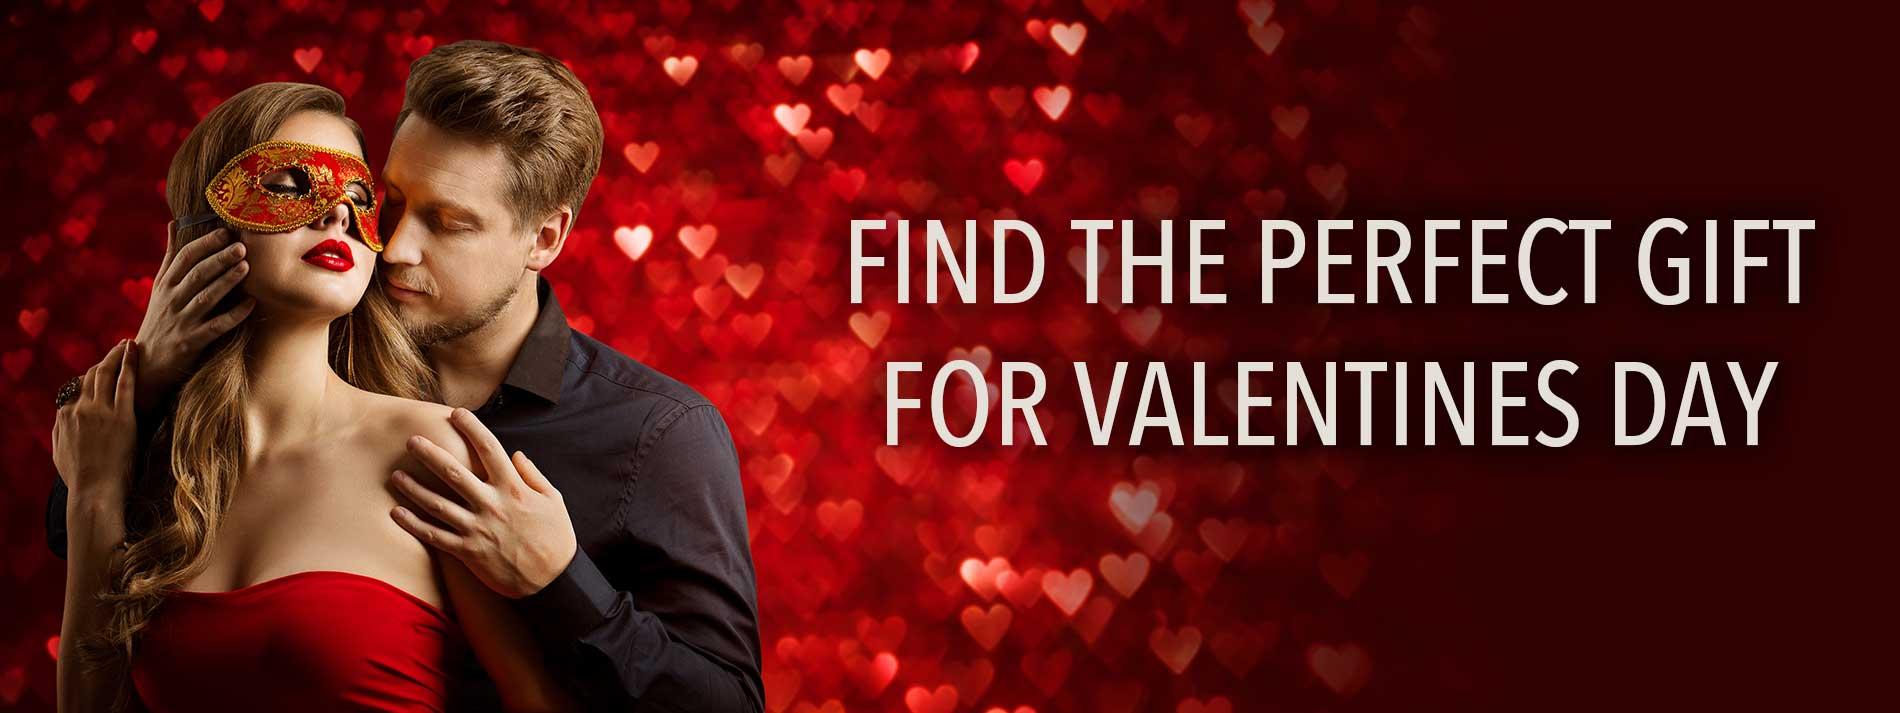 Tabu Valentines Day Gifts